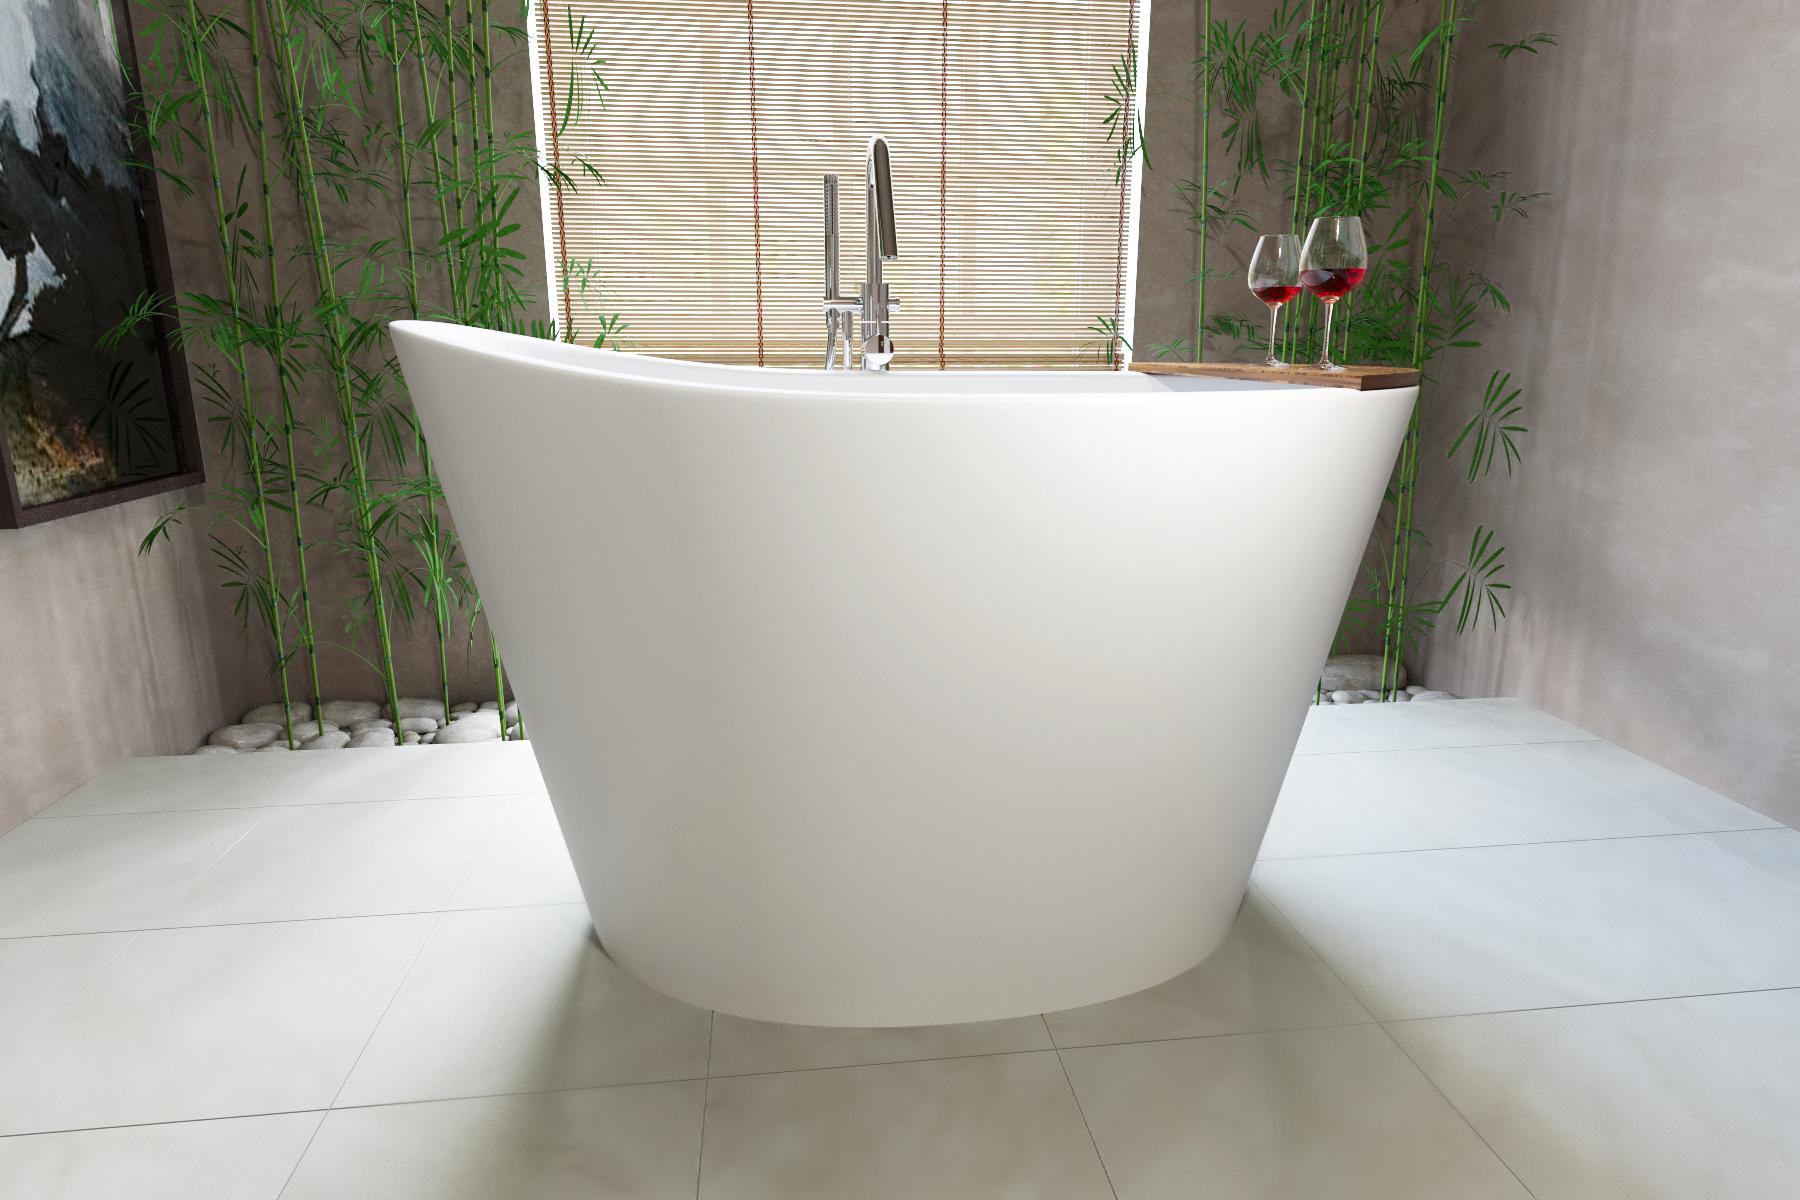 aquatica true ofuro freistehende stein badewanne. Black Bedroom Furniture Sets. Home Design Ideas